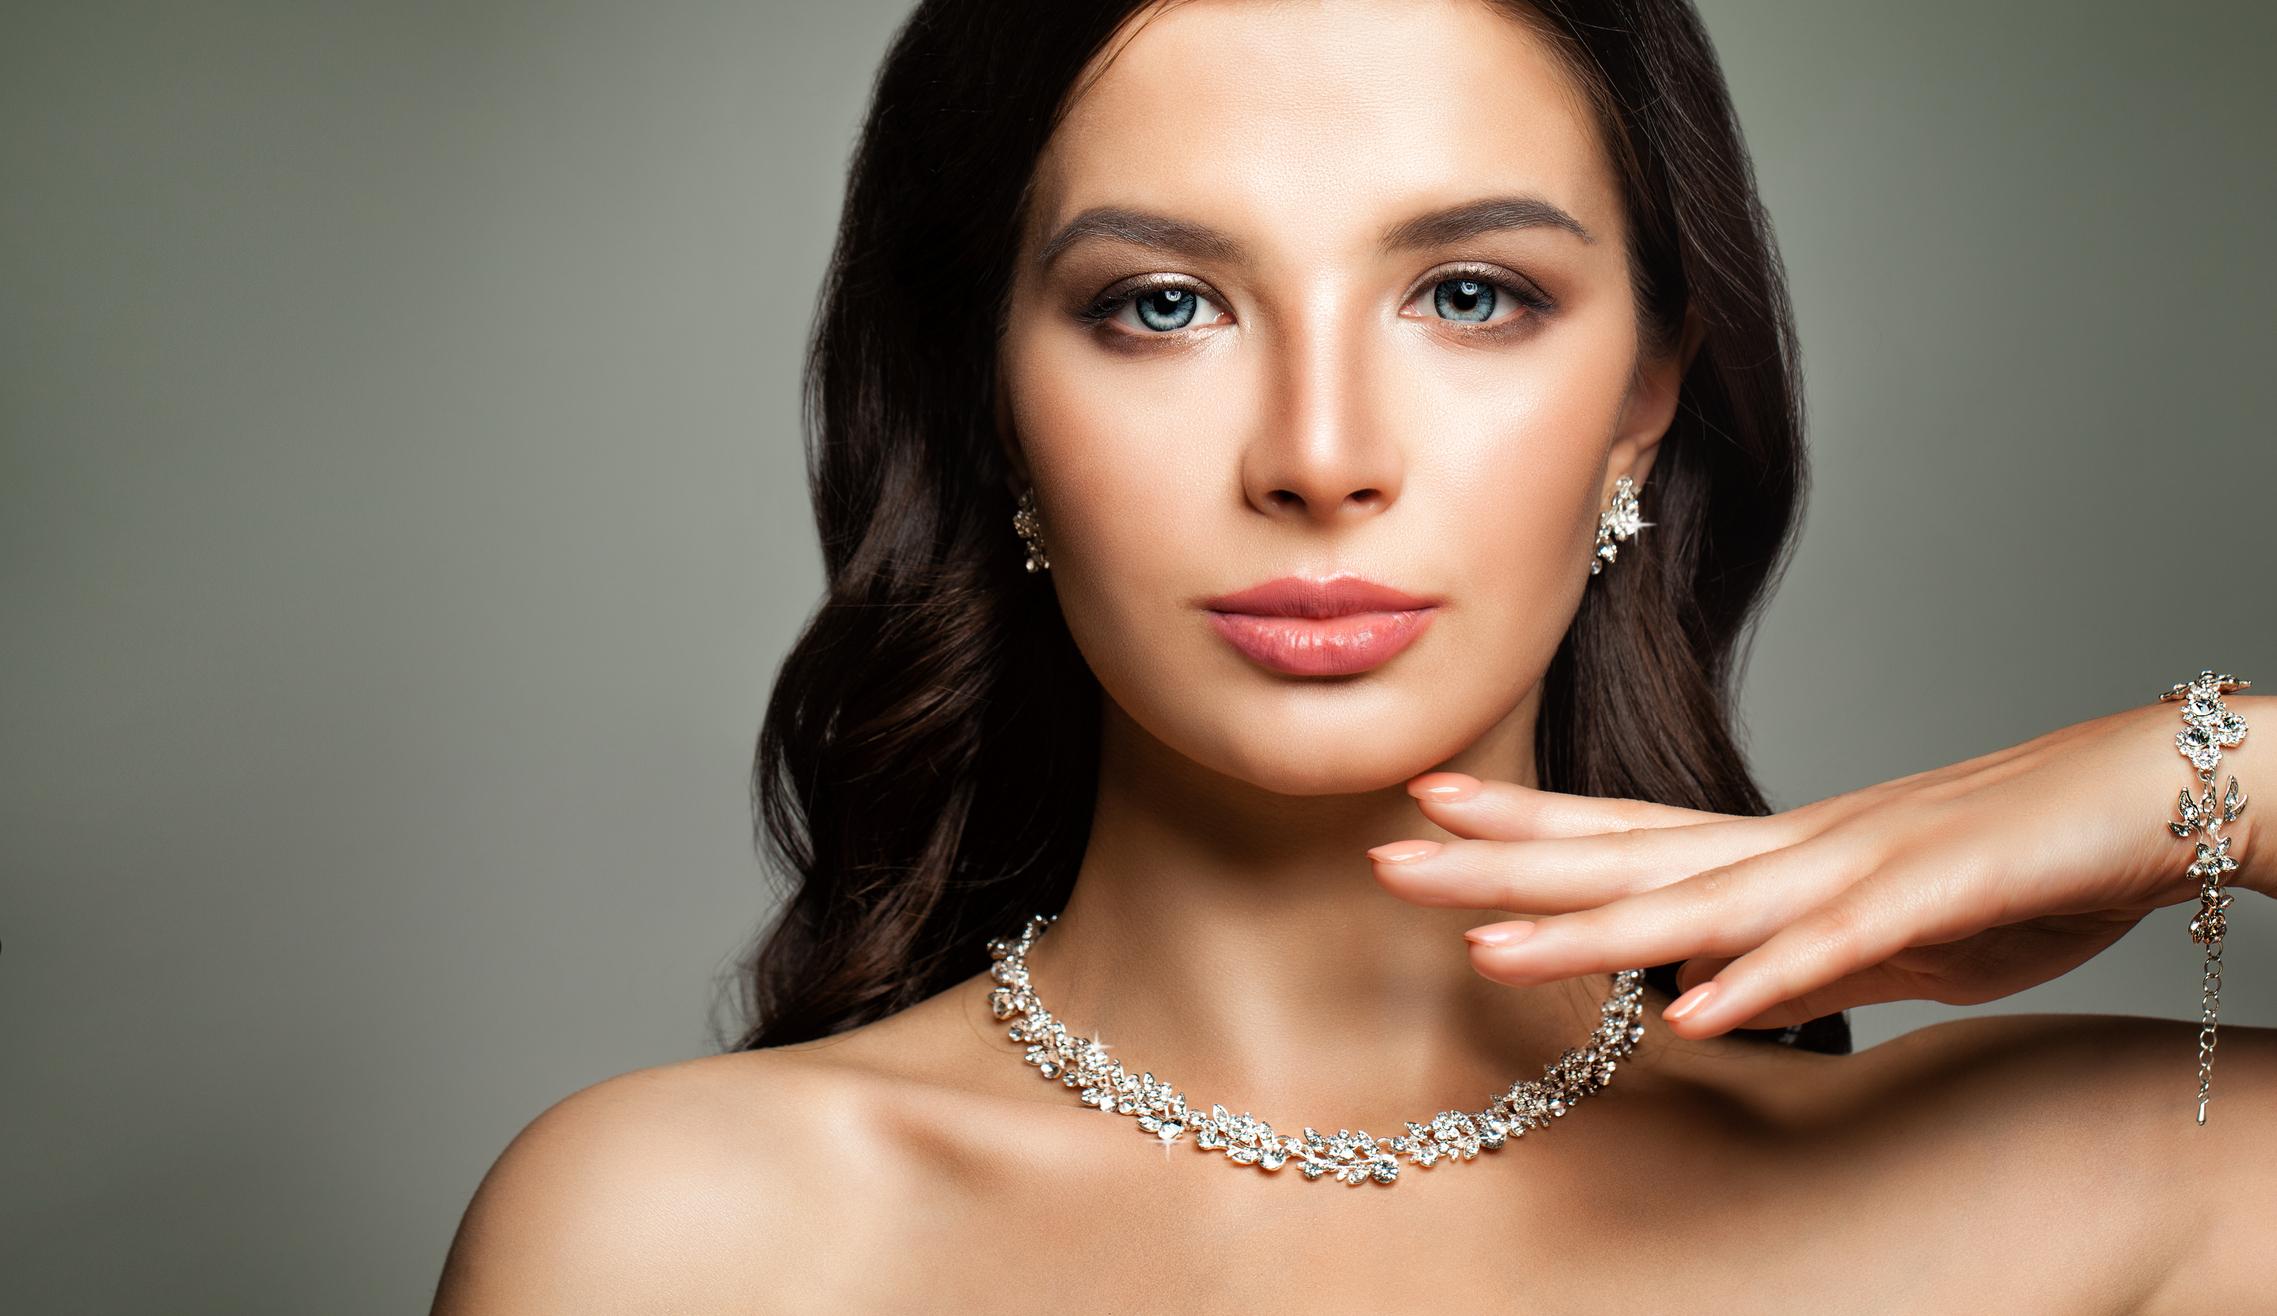 A woman wearing diamond earrings, necklace, and bracelet.